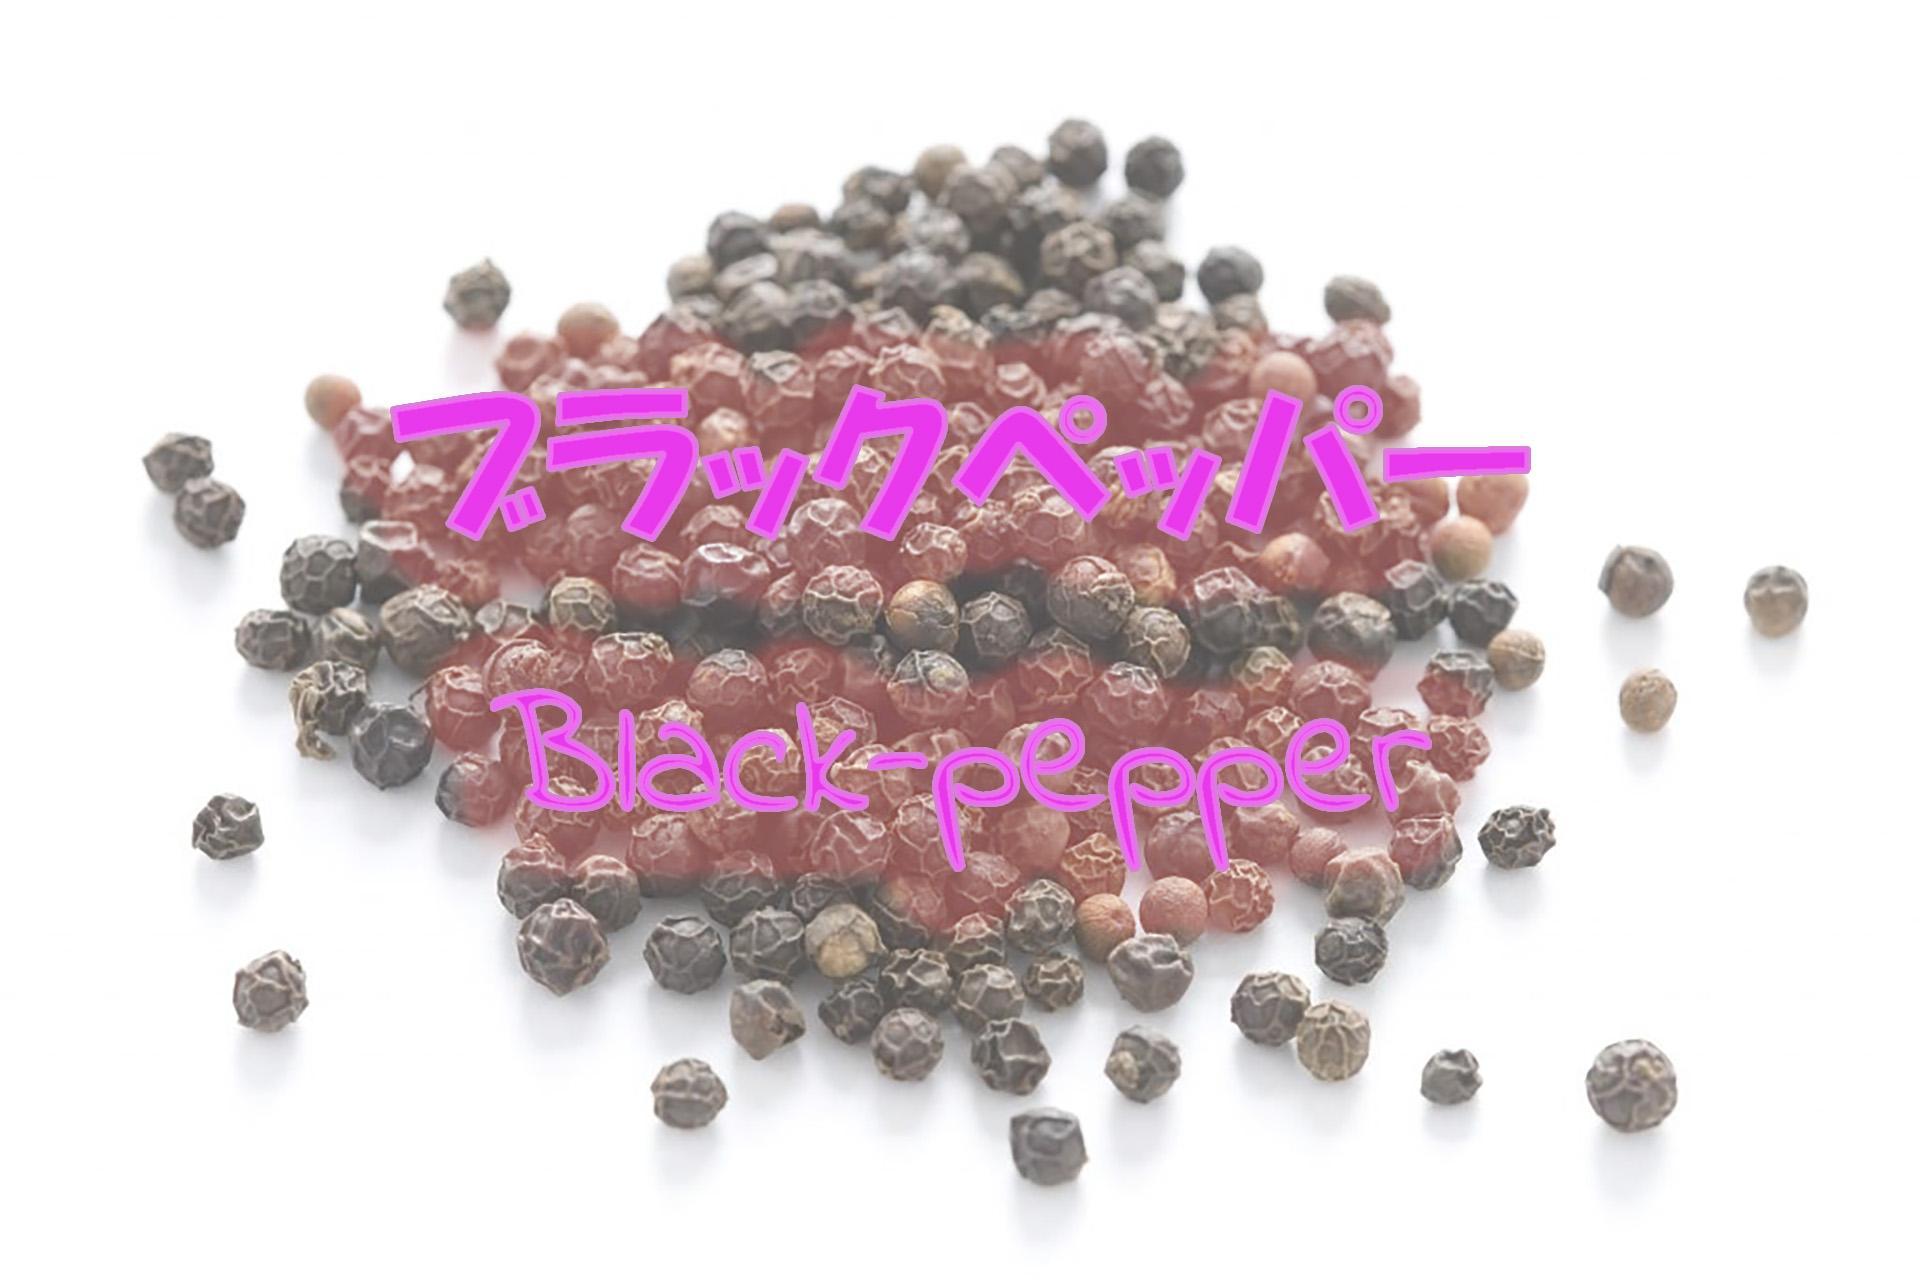 black-pepper_191117